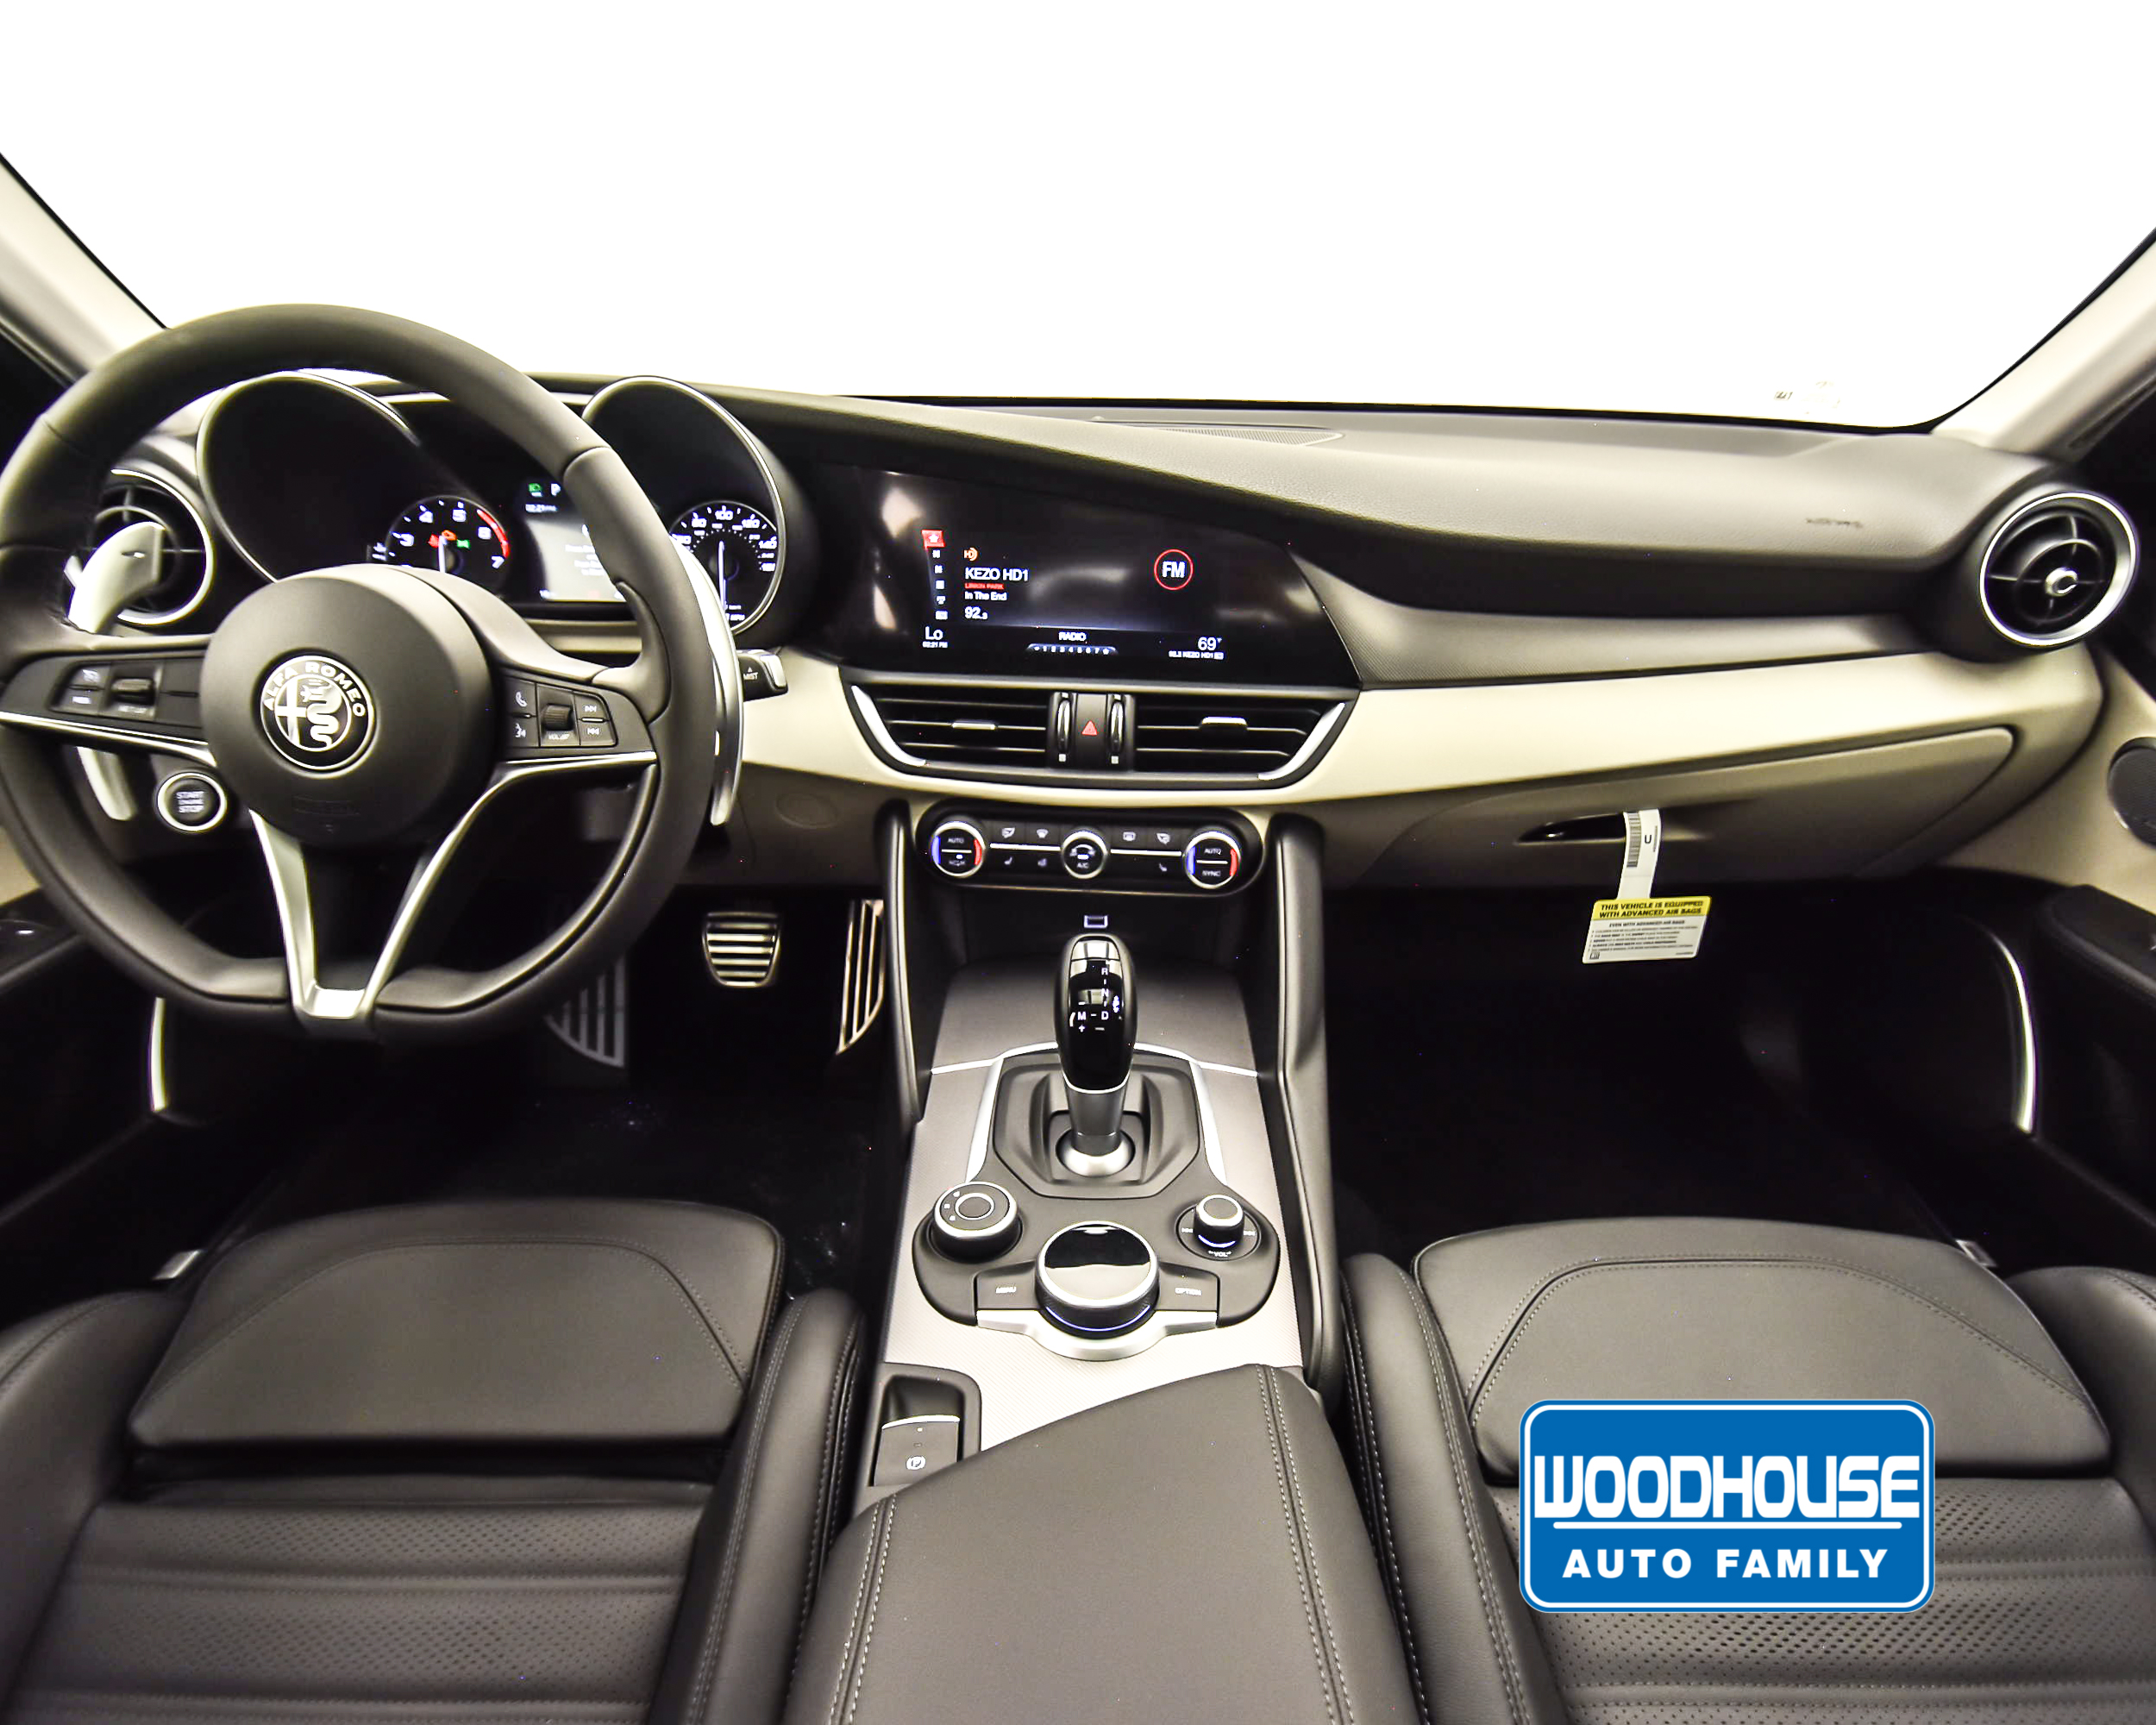 Woodhouse New 2018 Alfa Romeo Giulia For Sale